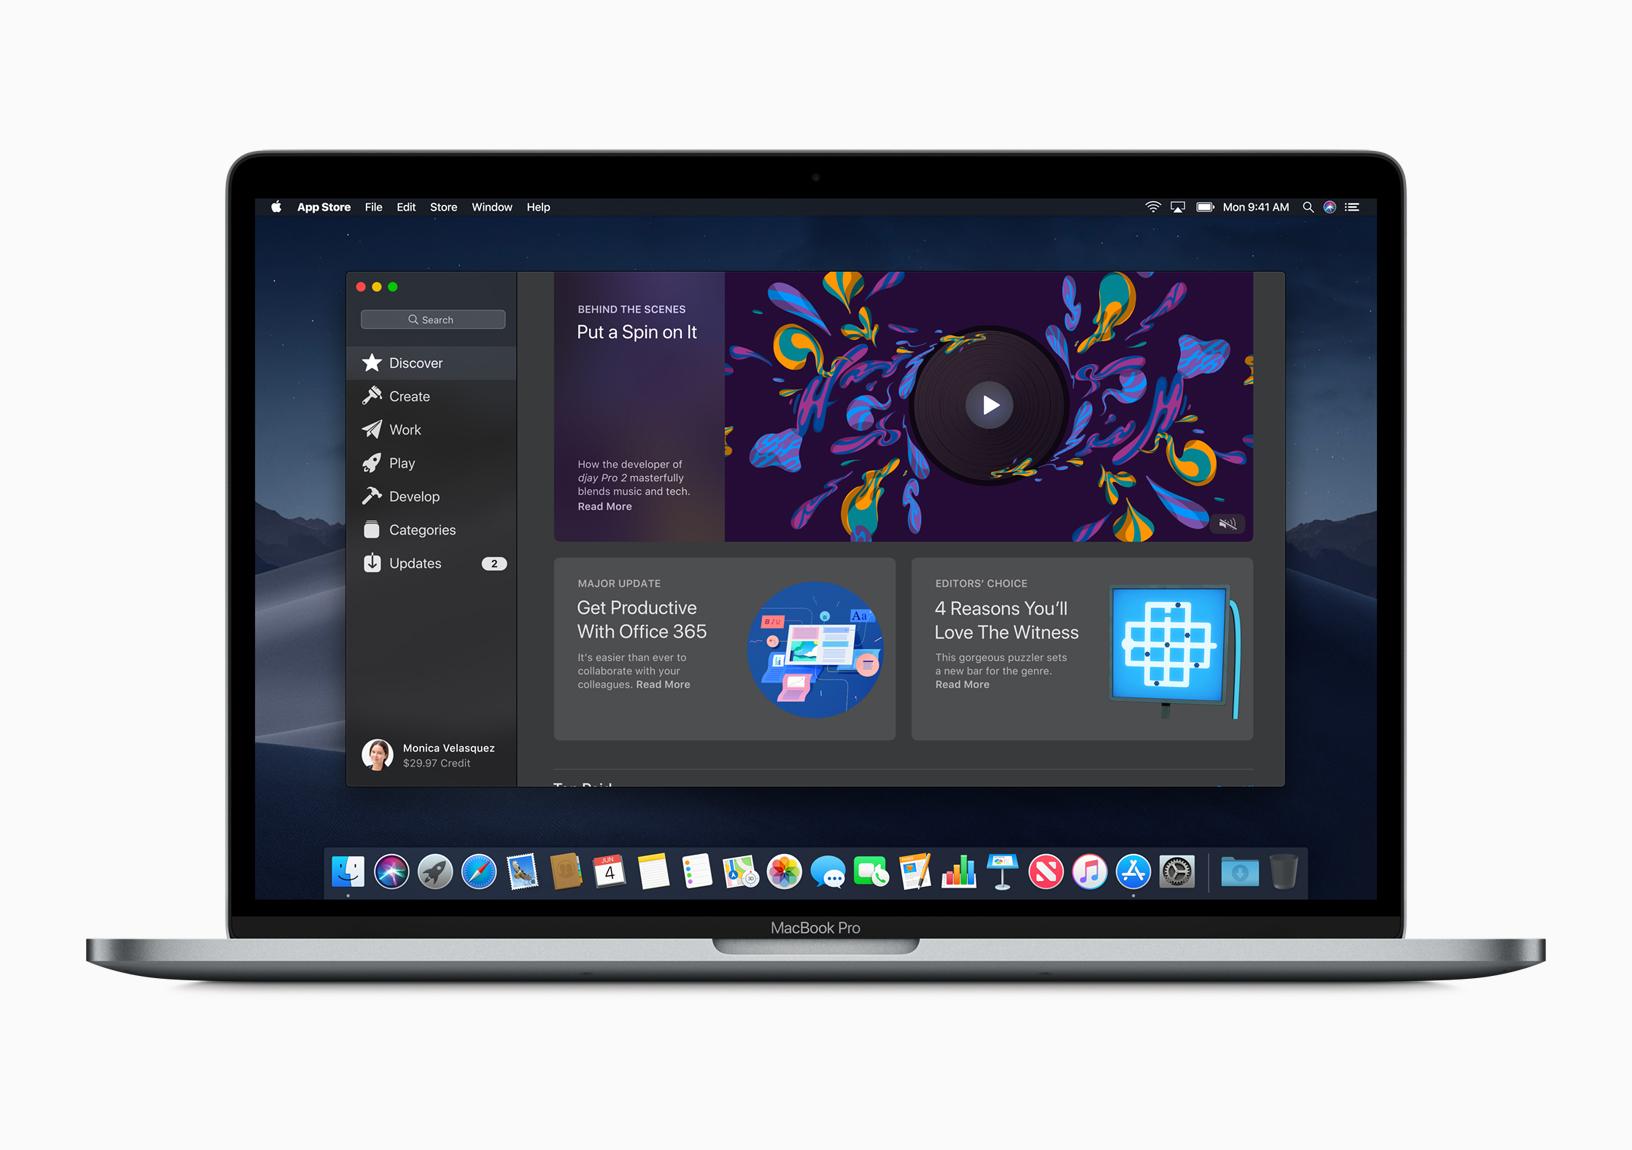 macOS 10.14 nuovo mac app store